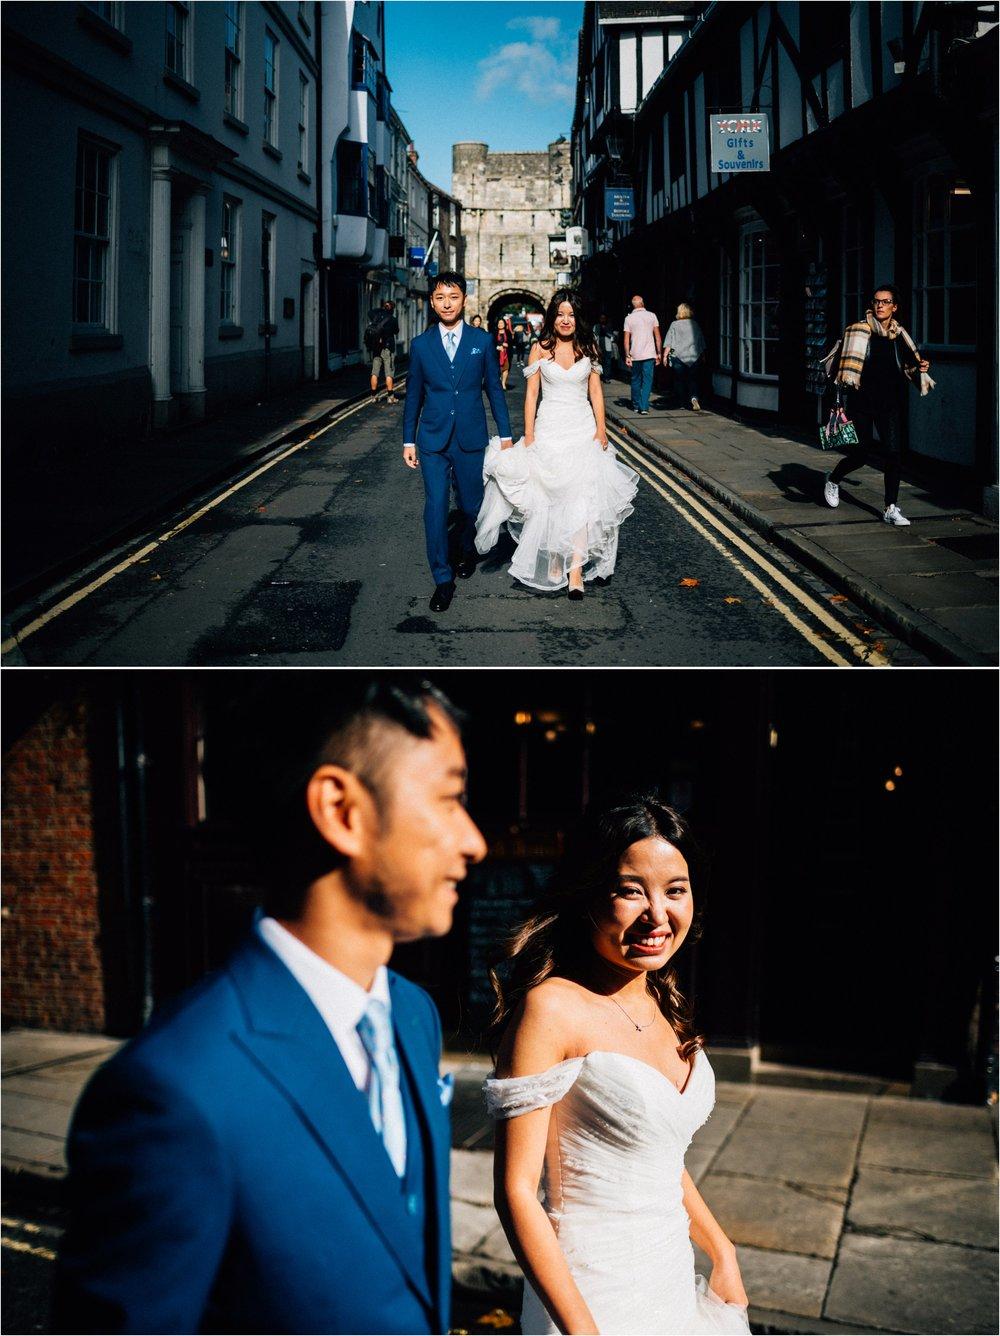 York city elopement wedding photographer_0070.jpg